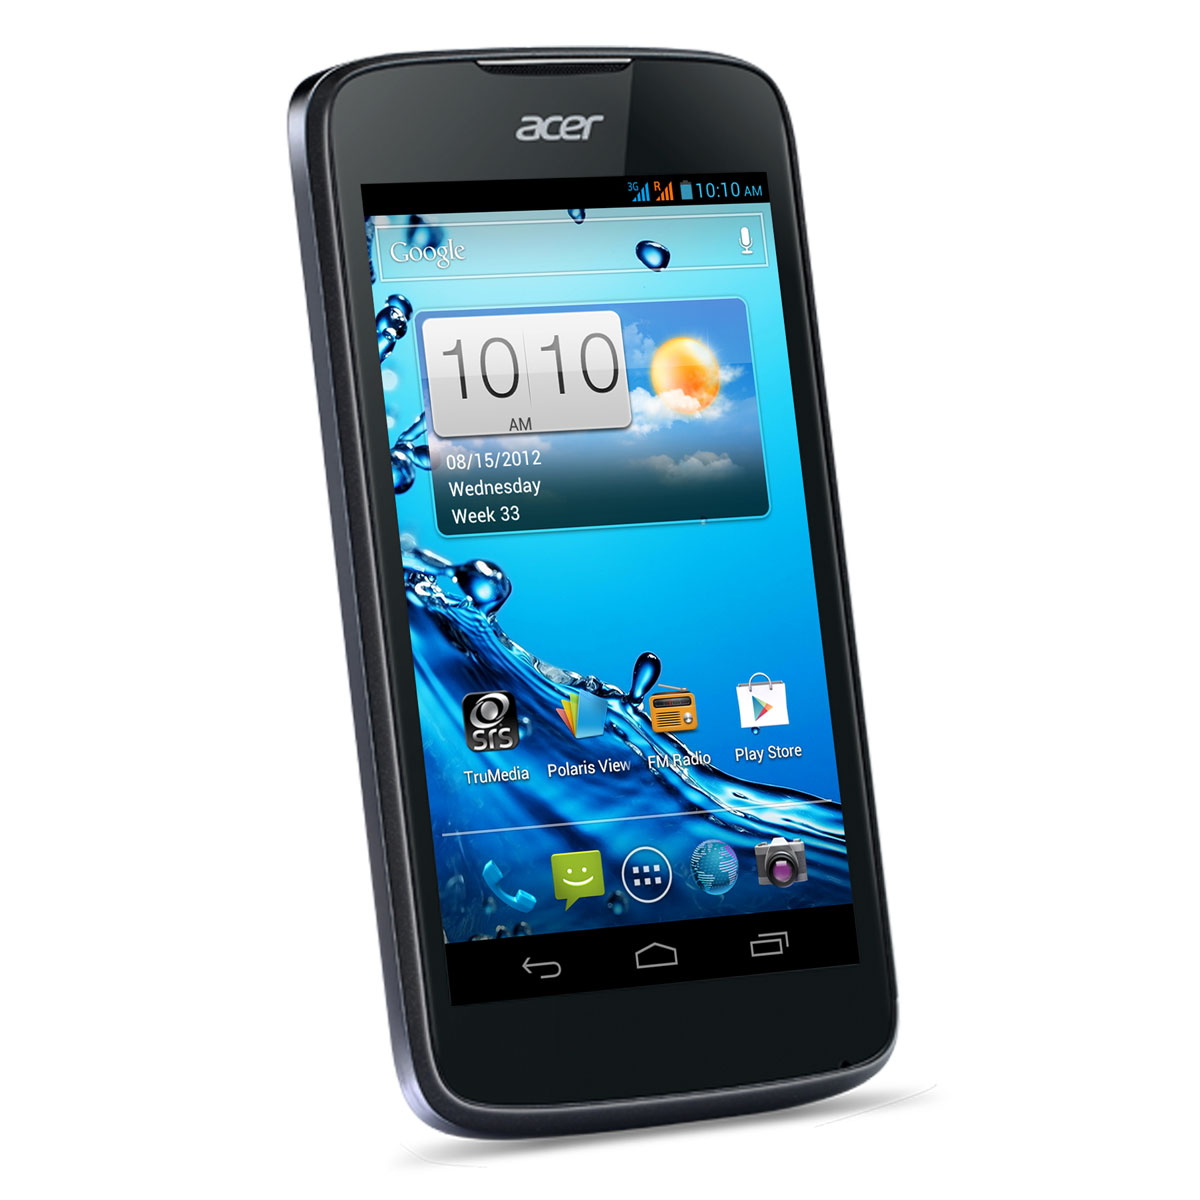 "Mobile & smartphone Acer Liquid Gallant Duo E350 Deep Black Smartphone 3G+ Dual Sim avec écran tactile 4.3"" sous Android 4.0"